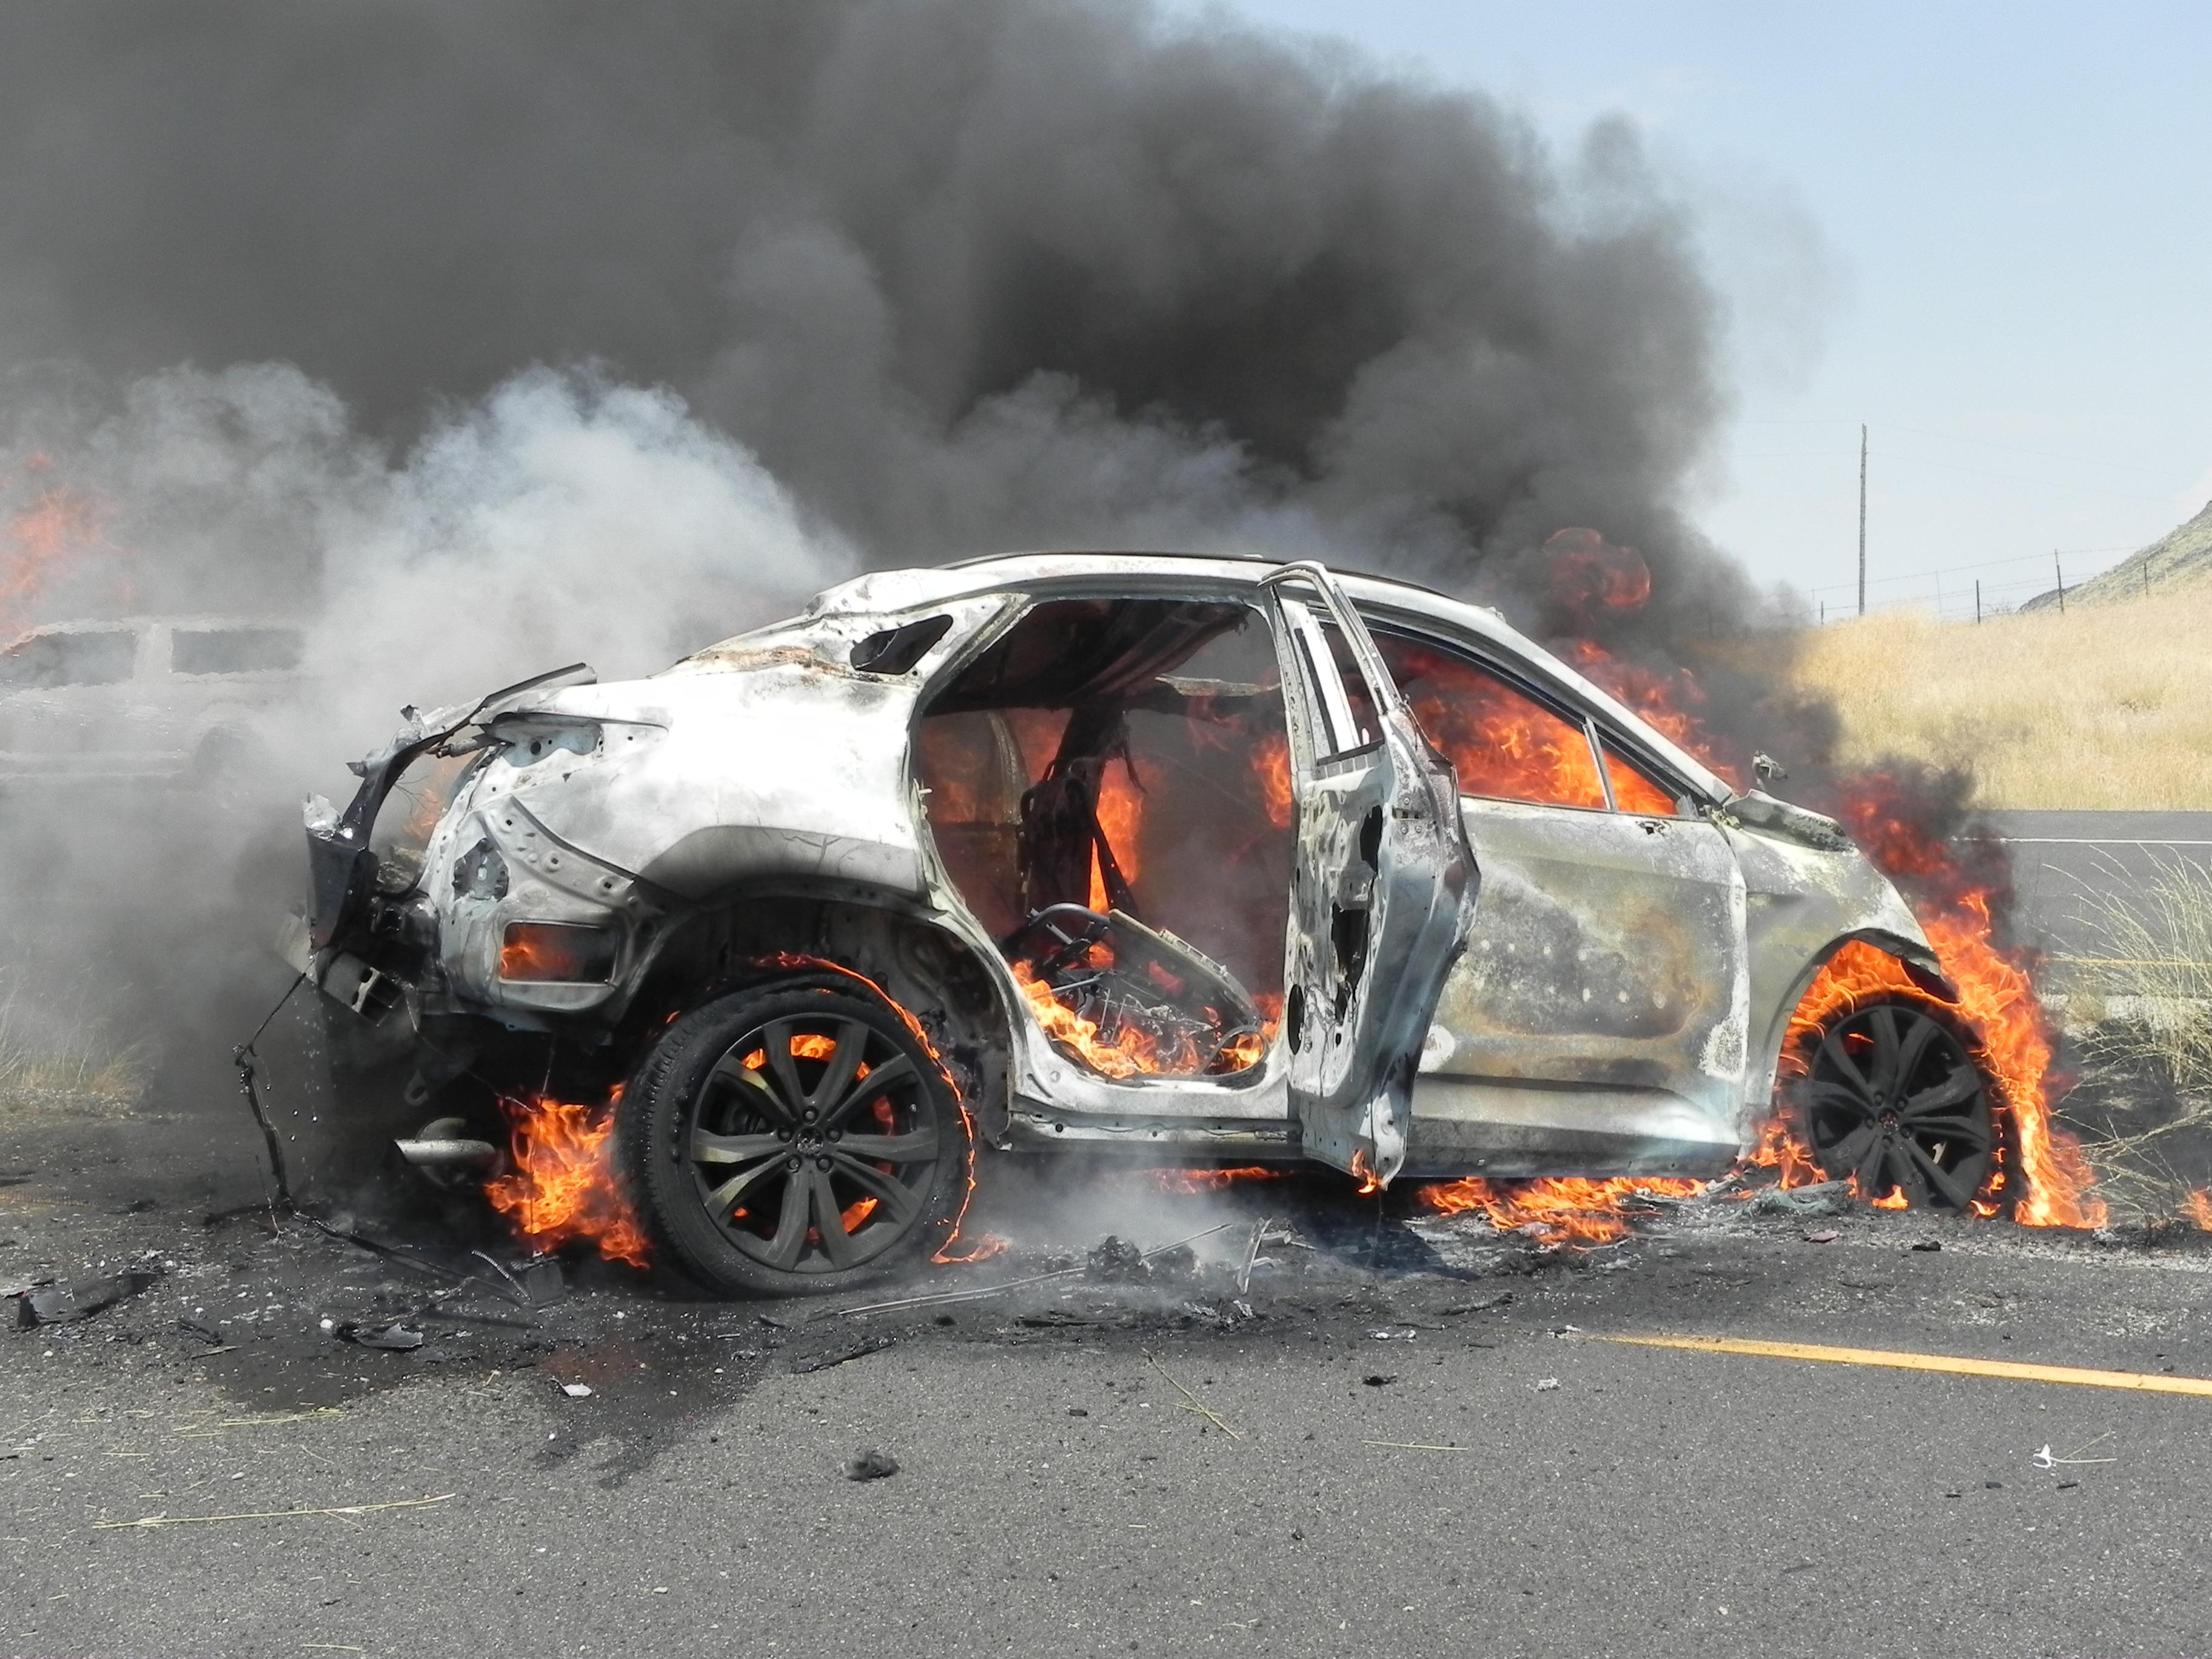 Update: 18-year-old killed in single-vehicle crash on I-84 near